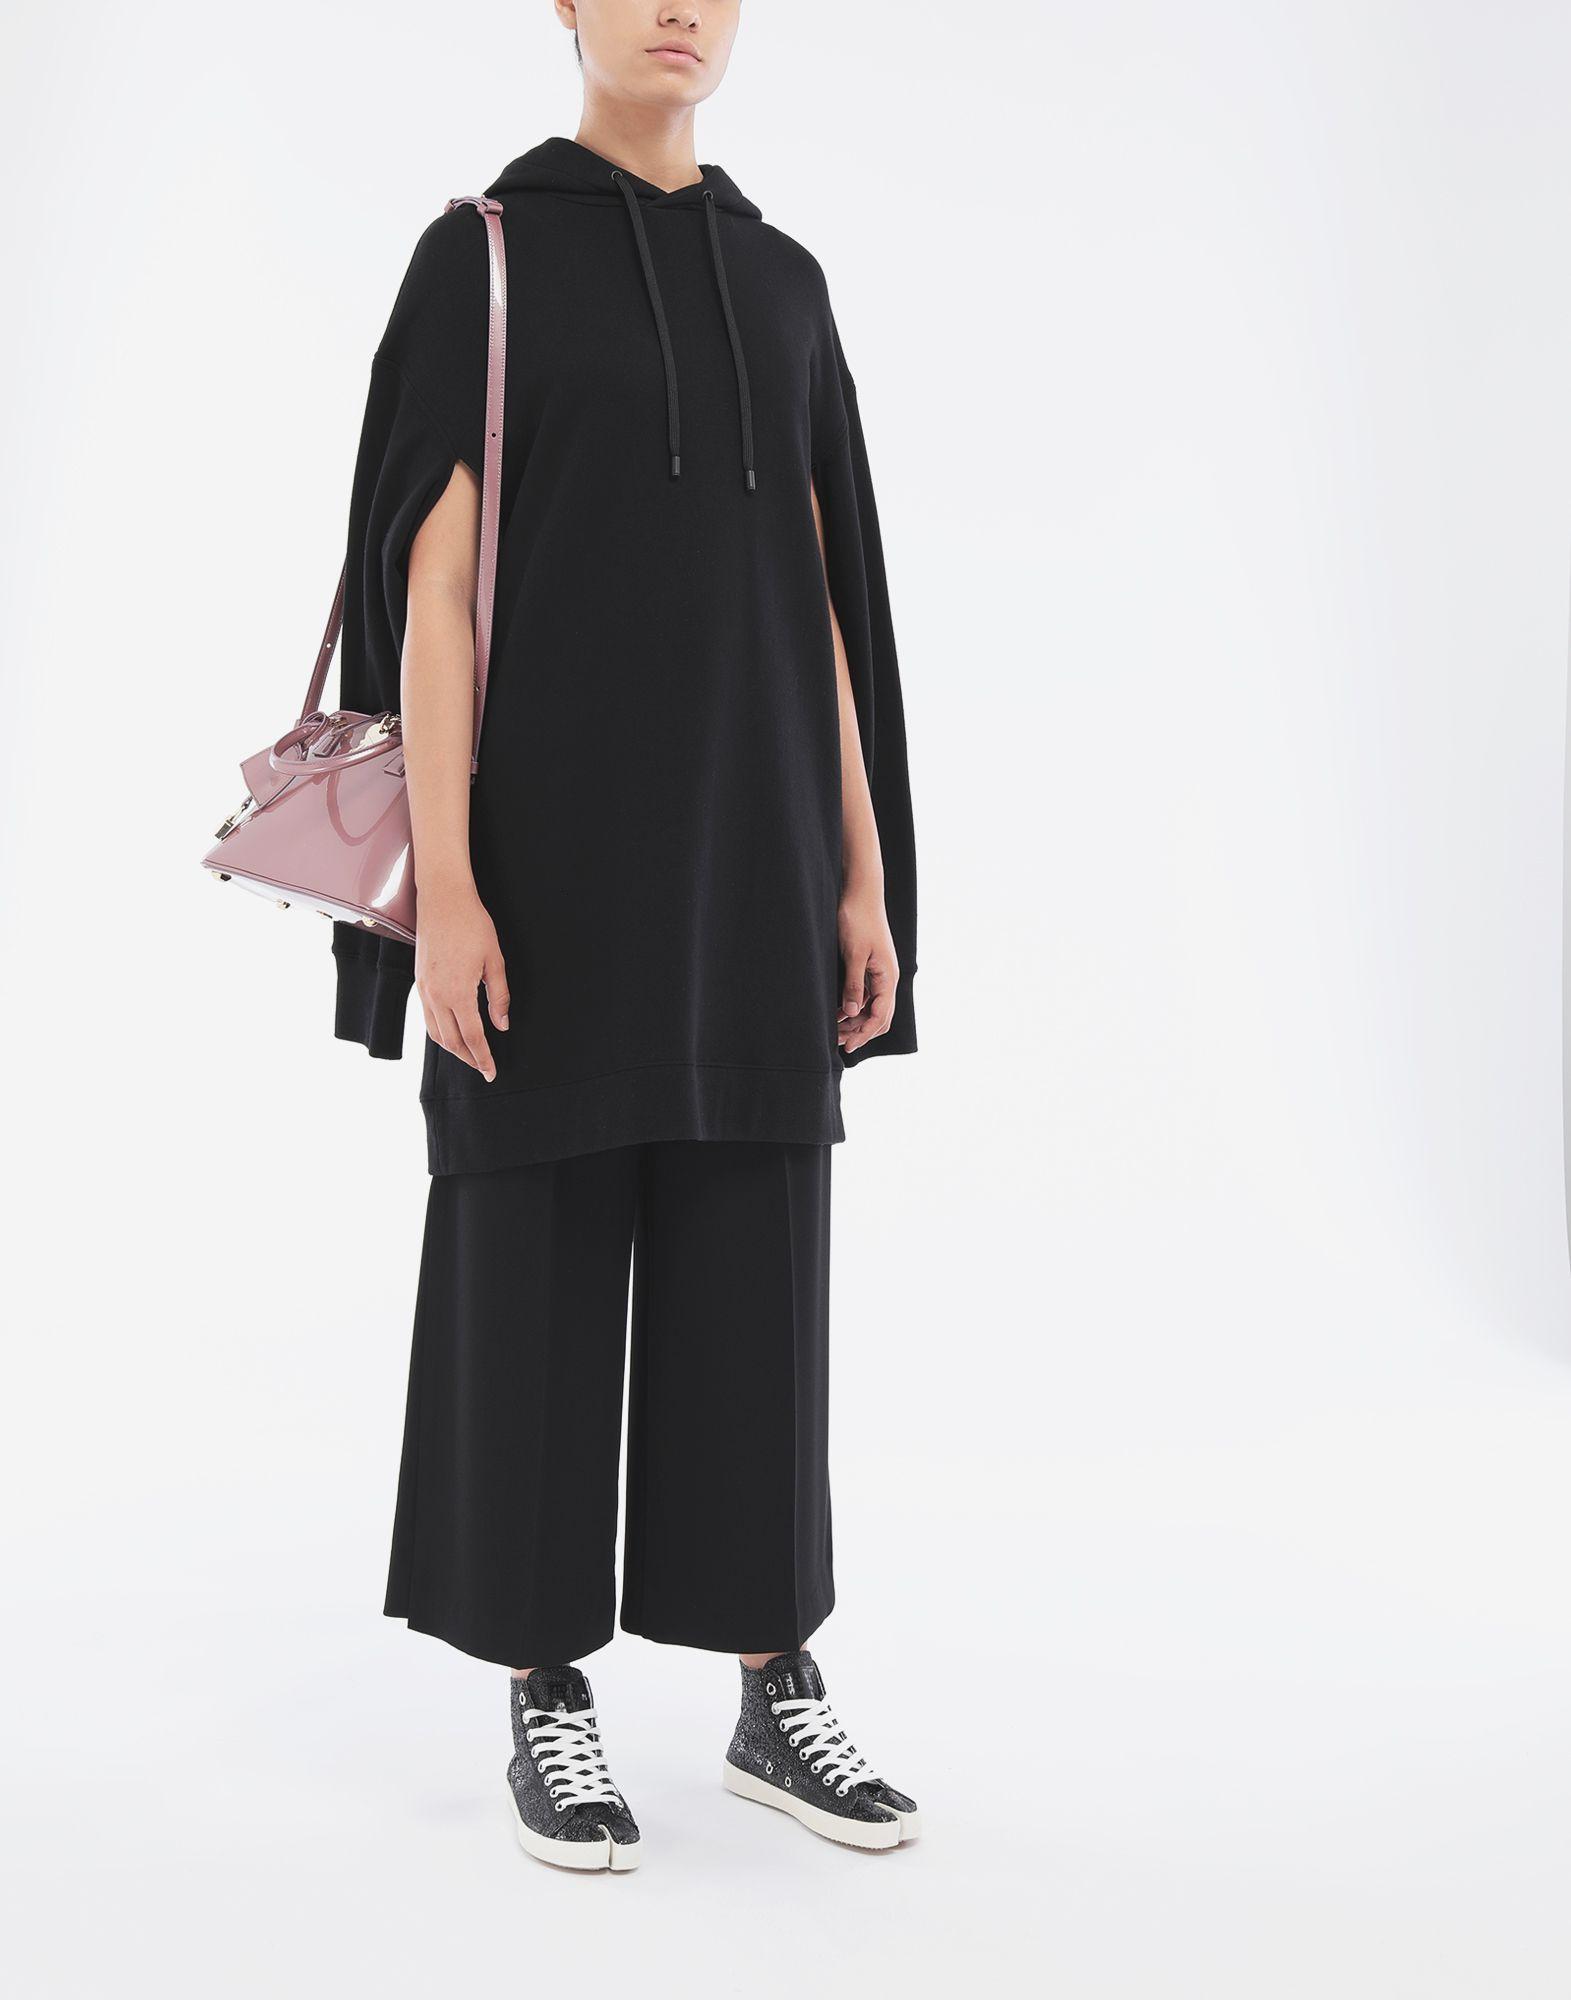 MAISON MARGIELA Long-line hooded sweatshirt Hooded sweatshirt Woman d